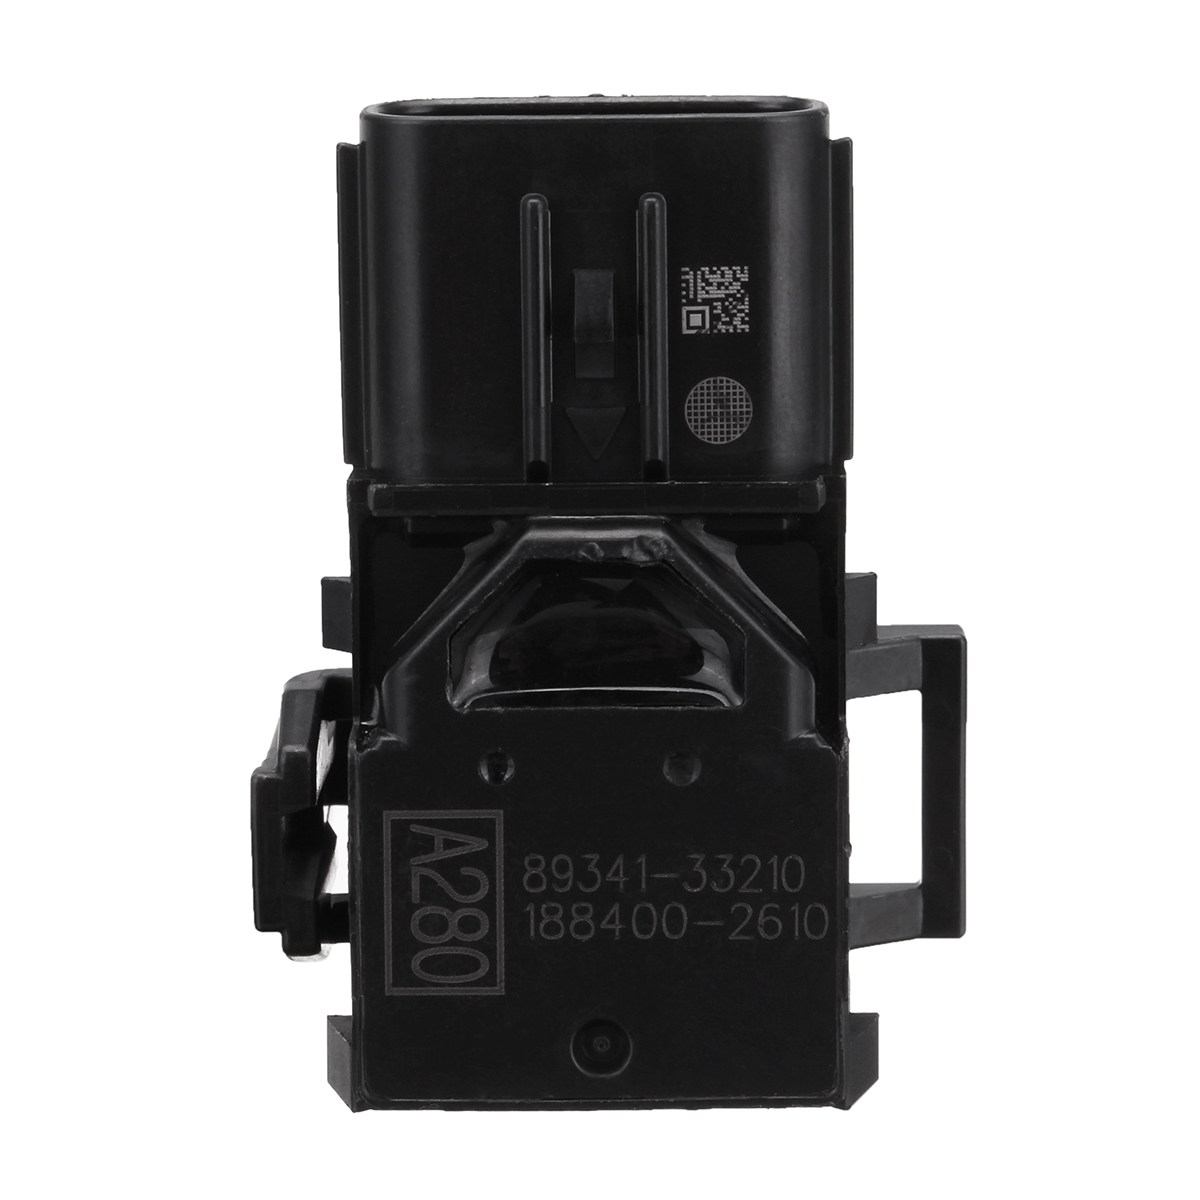 hight resolution of  89341 33210 188400 2610 89341 33210 b6 reverse parking aid sensor radar for lexus rx450h rx350 f sport base 3 5l v6 2013 2014 in parking sensors from